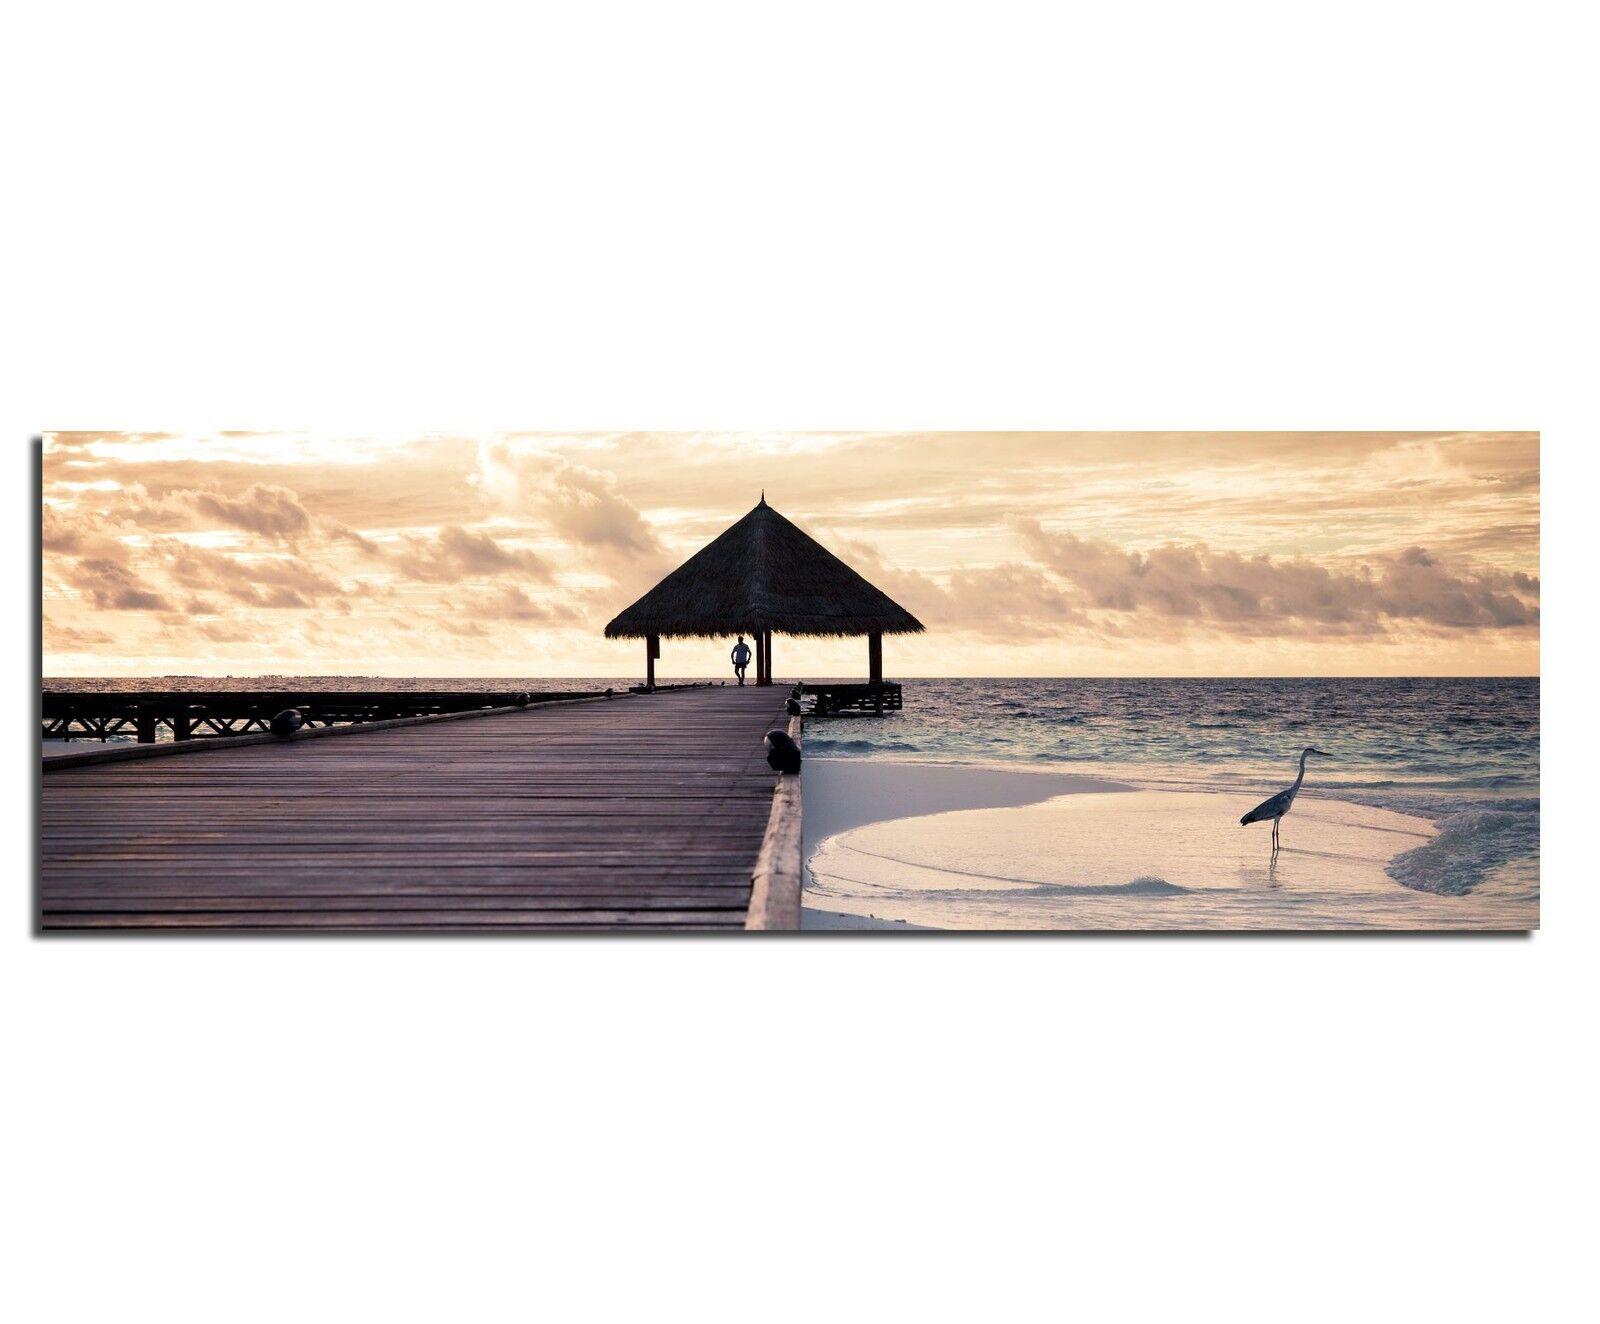 LeinwandBild Bild Wandbild Tropical Island Romantik Steg Sonnenuntergang Meer